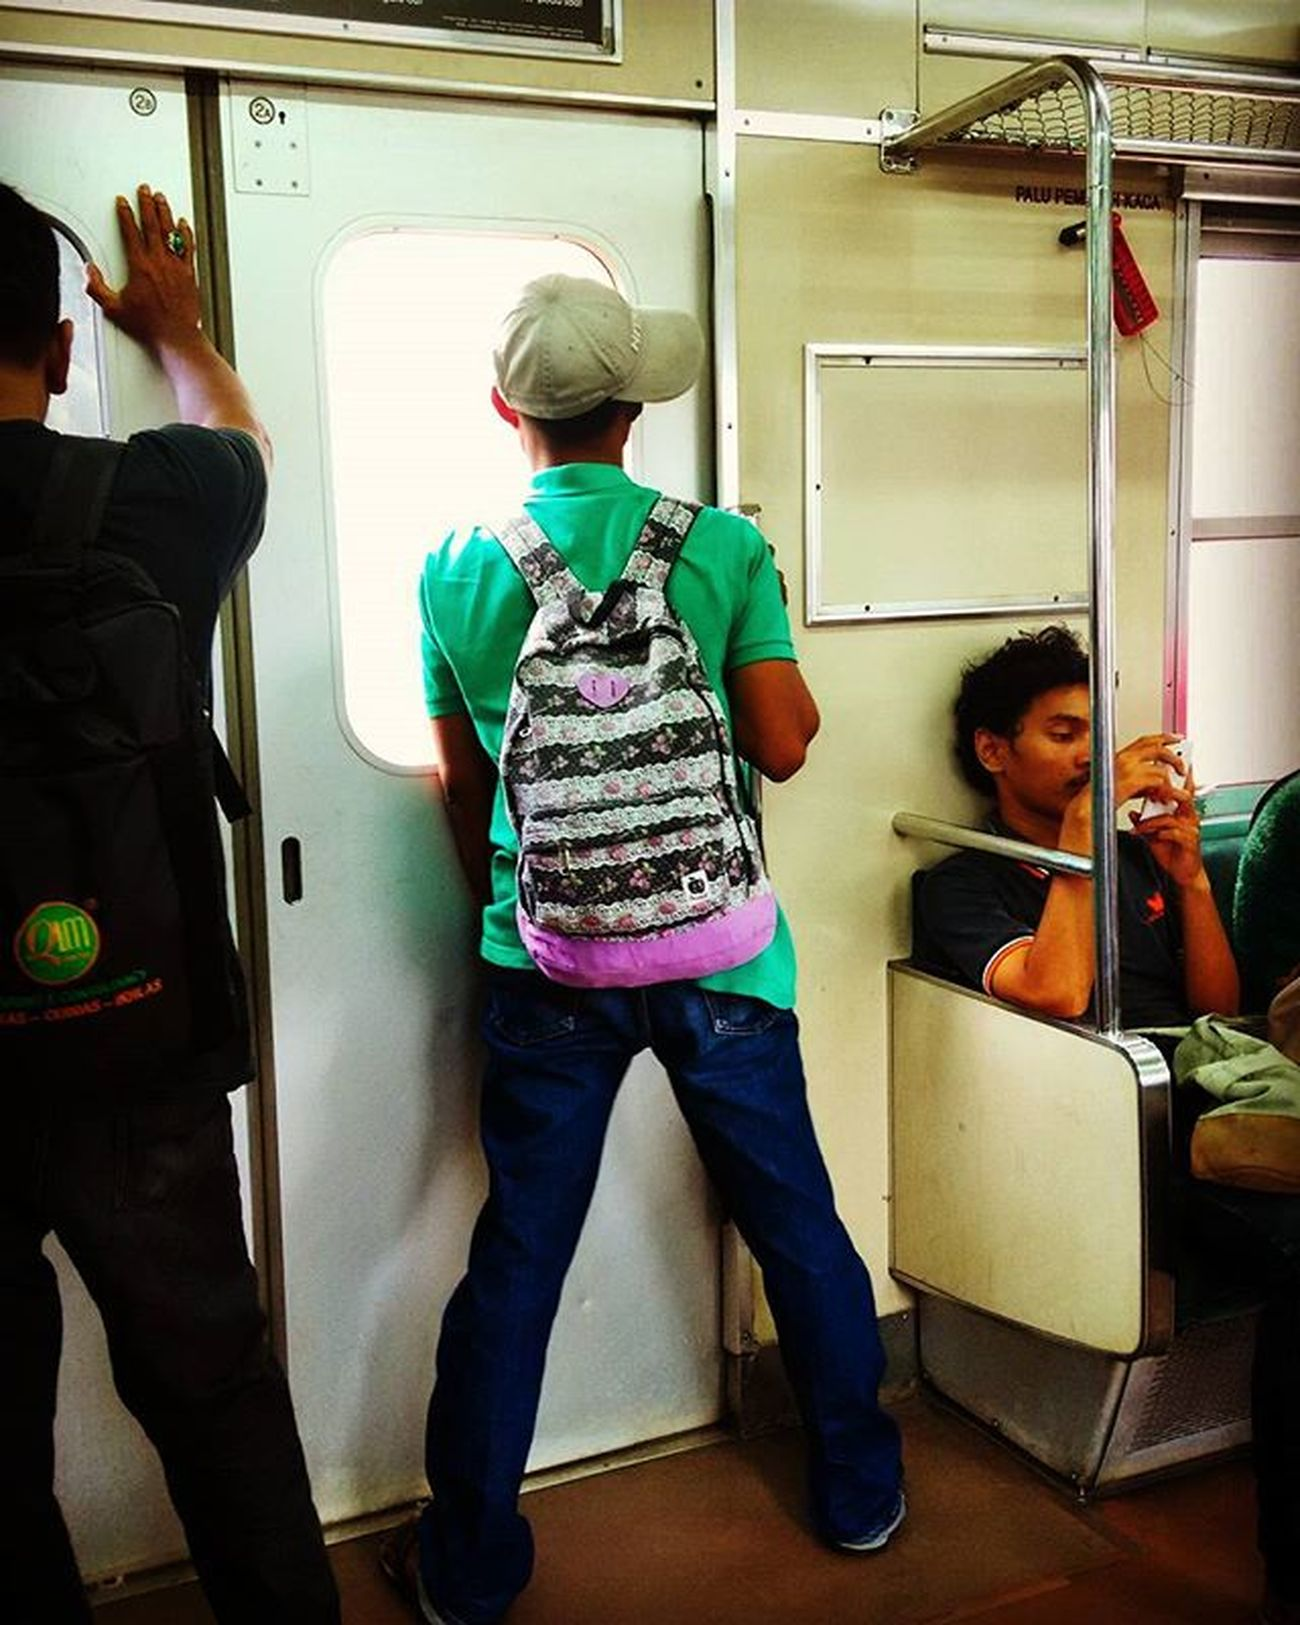 Mas plis mas jangan pipis di kereta 😁😅 Krl Kereta Urbanshot Suddenlyshot Justkidding Train Jakarta Humaninterestindonesia Pointofview Candid Shotbymi MIphotography